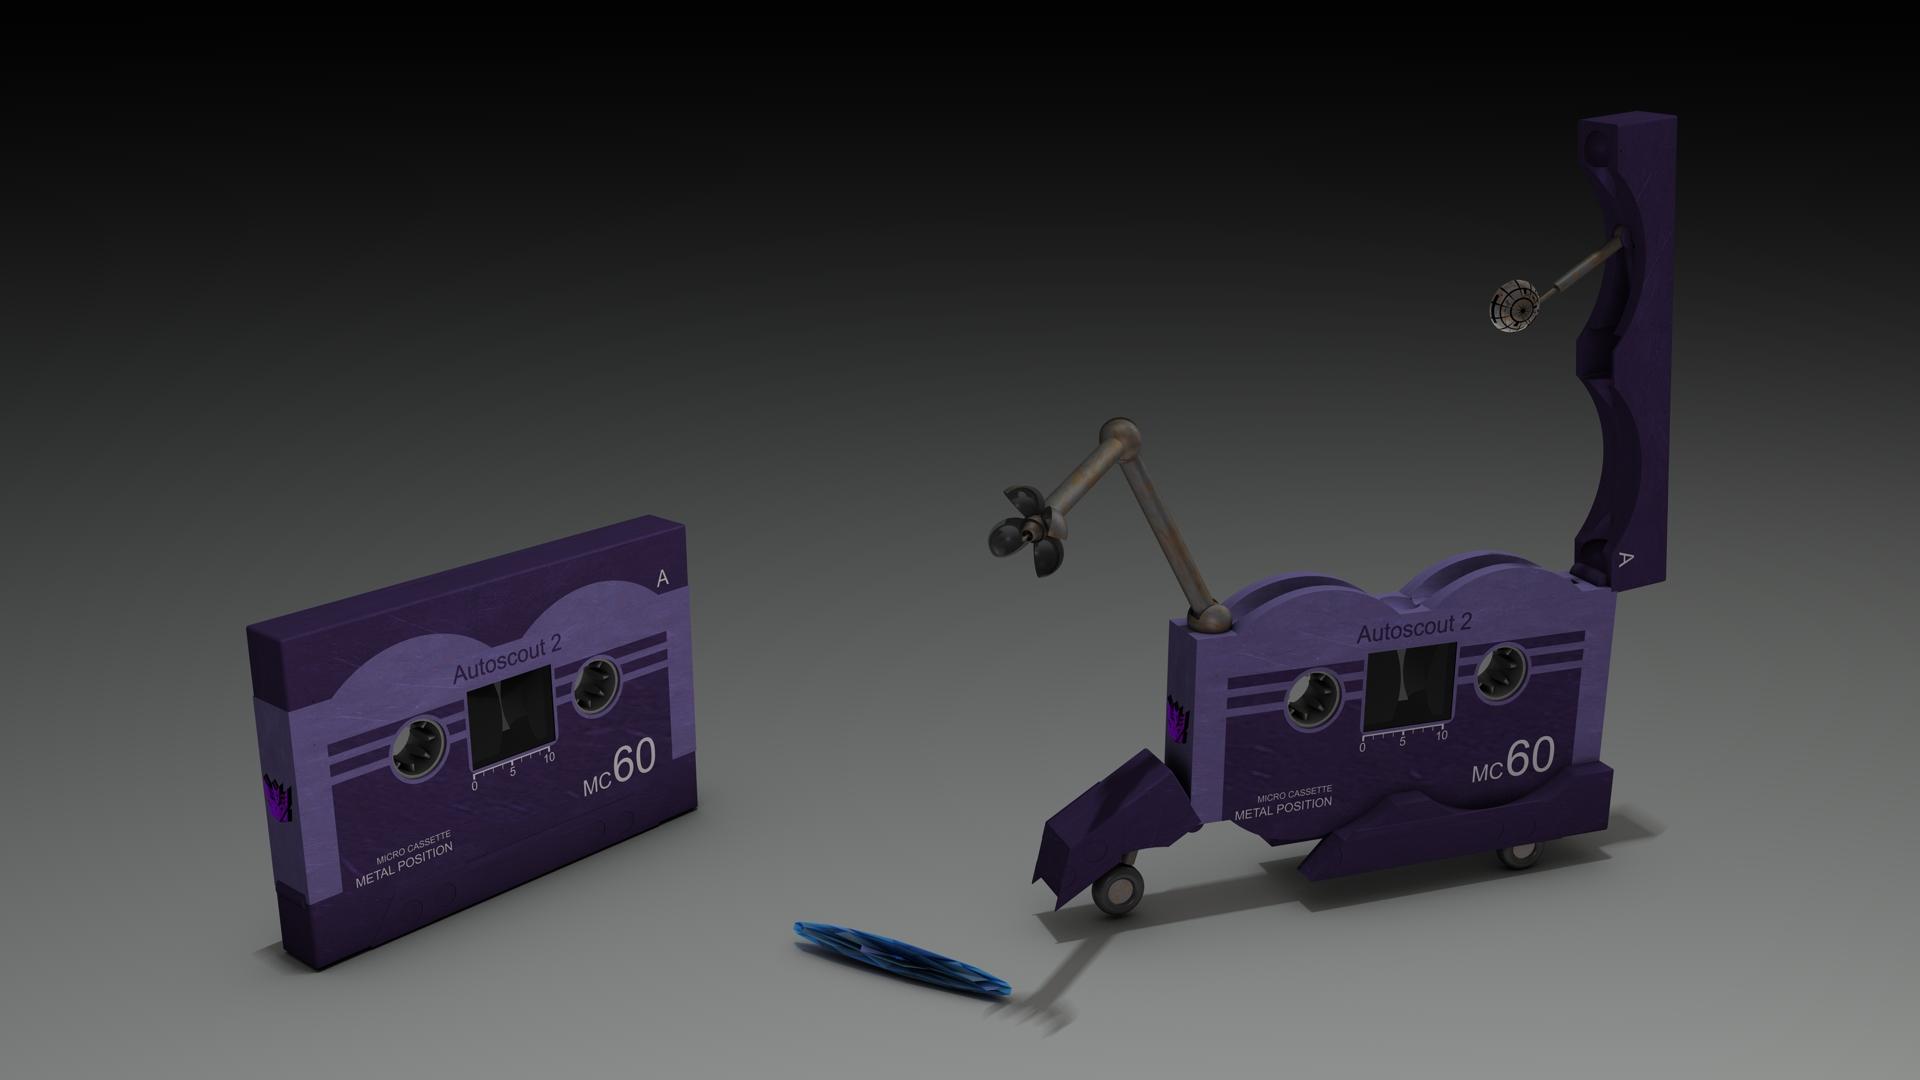 soundwave cassette - autoscout100seedlesspenguins on deviantart